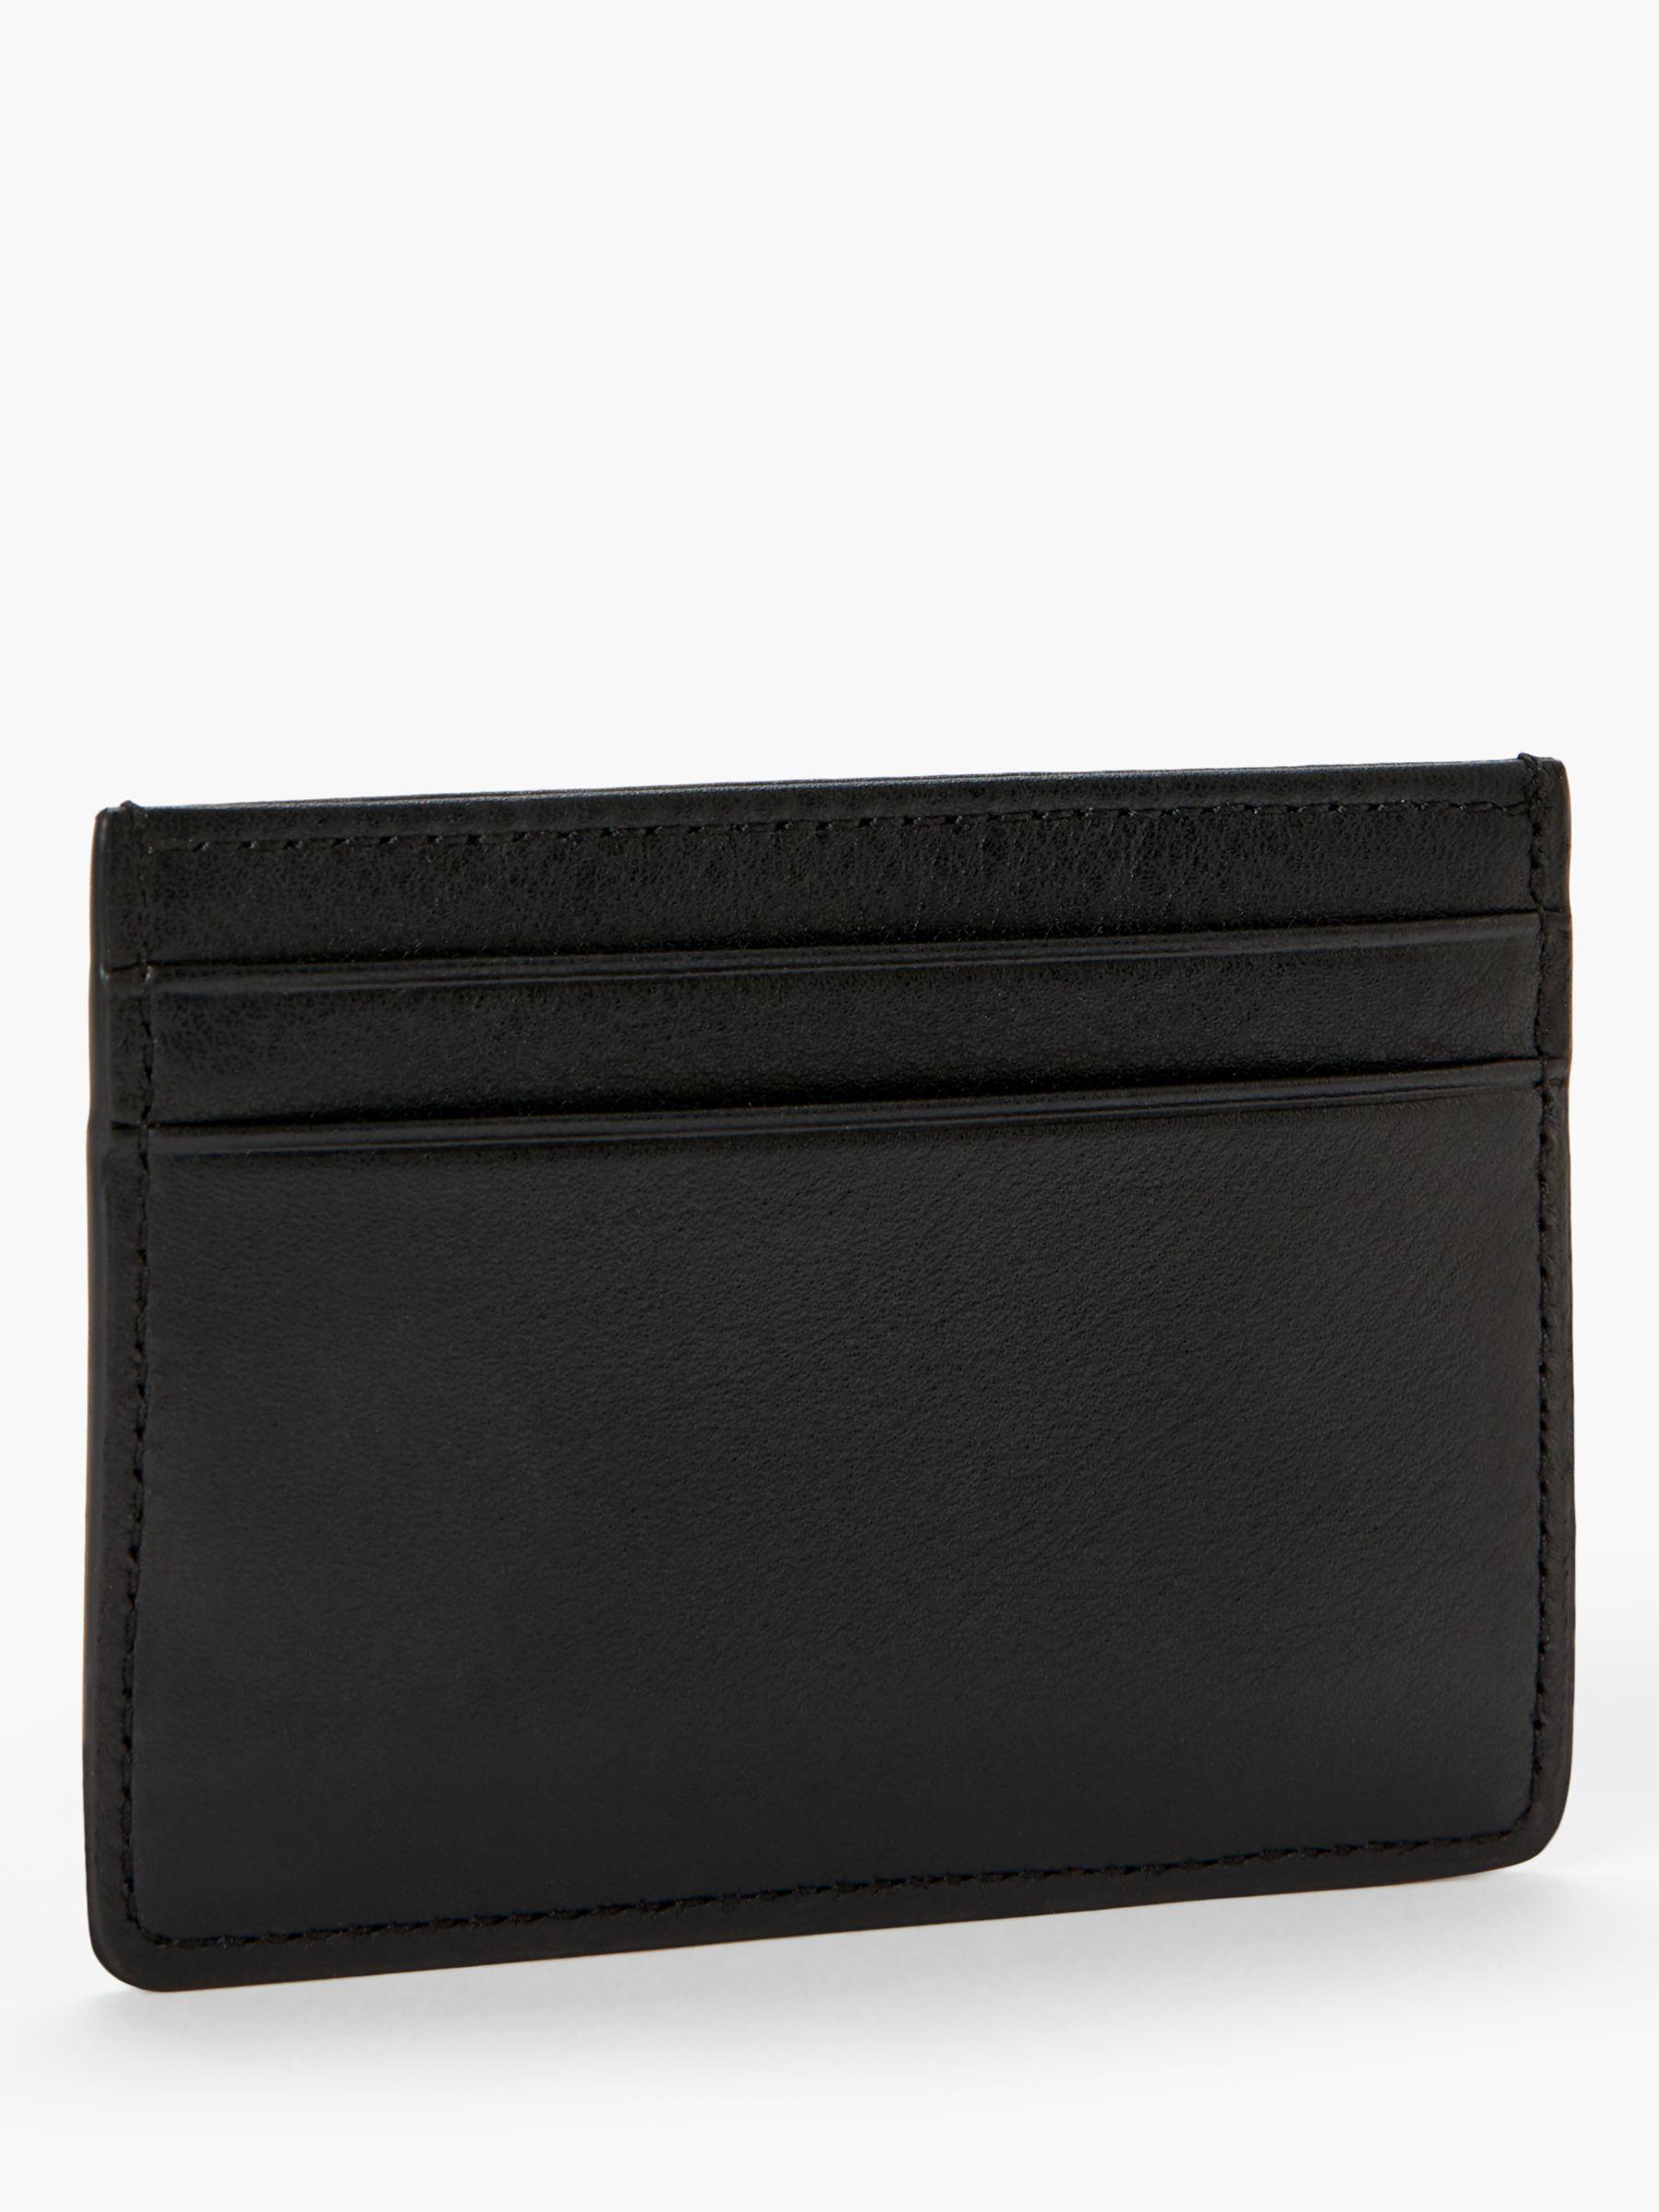 cb7dd6b367 BOSS Boss Majestic Nappa Leather Six Slot Card Holder in Black for ...